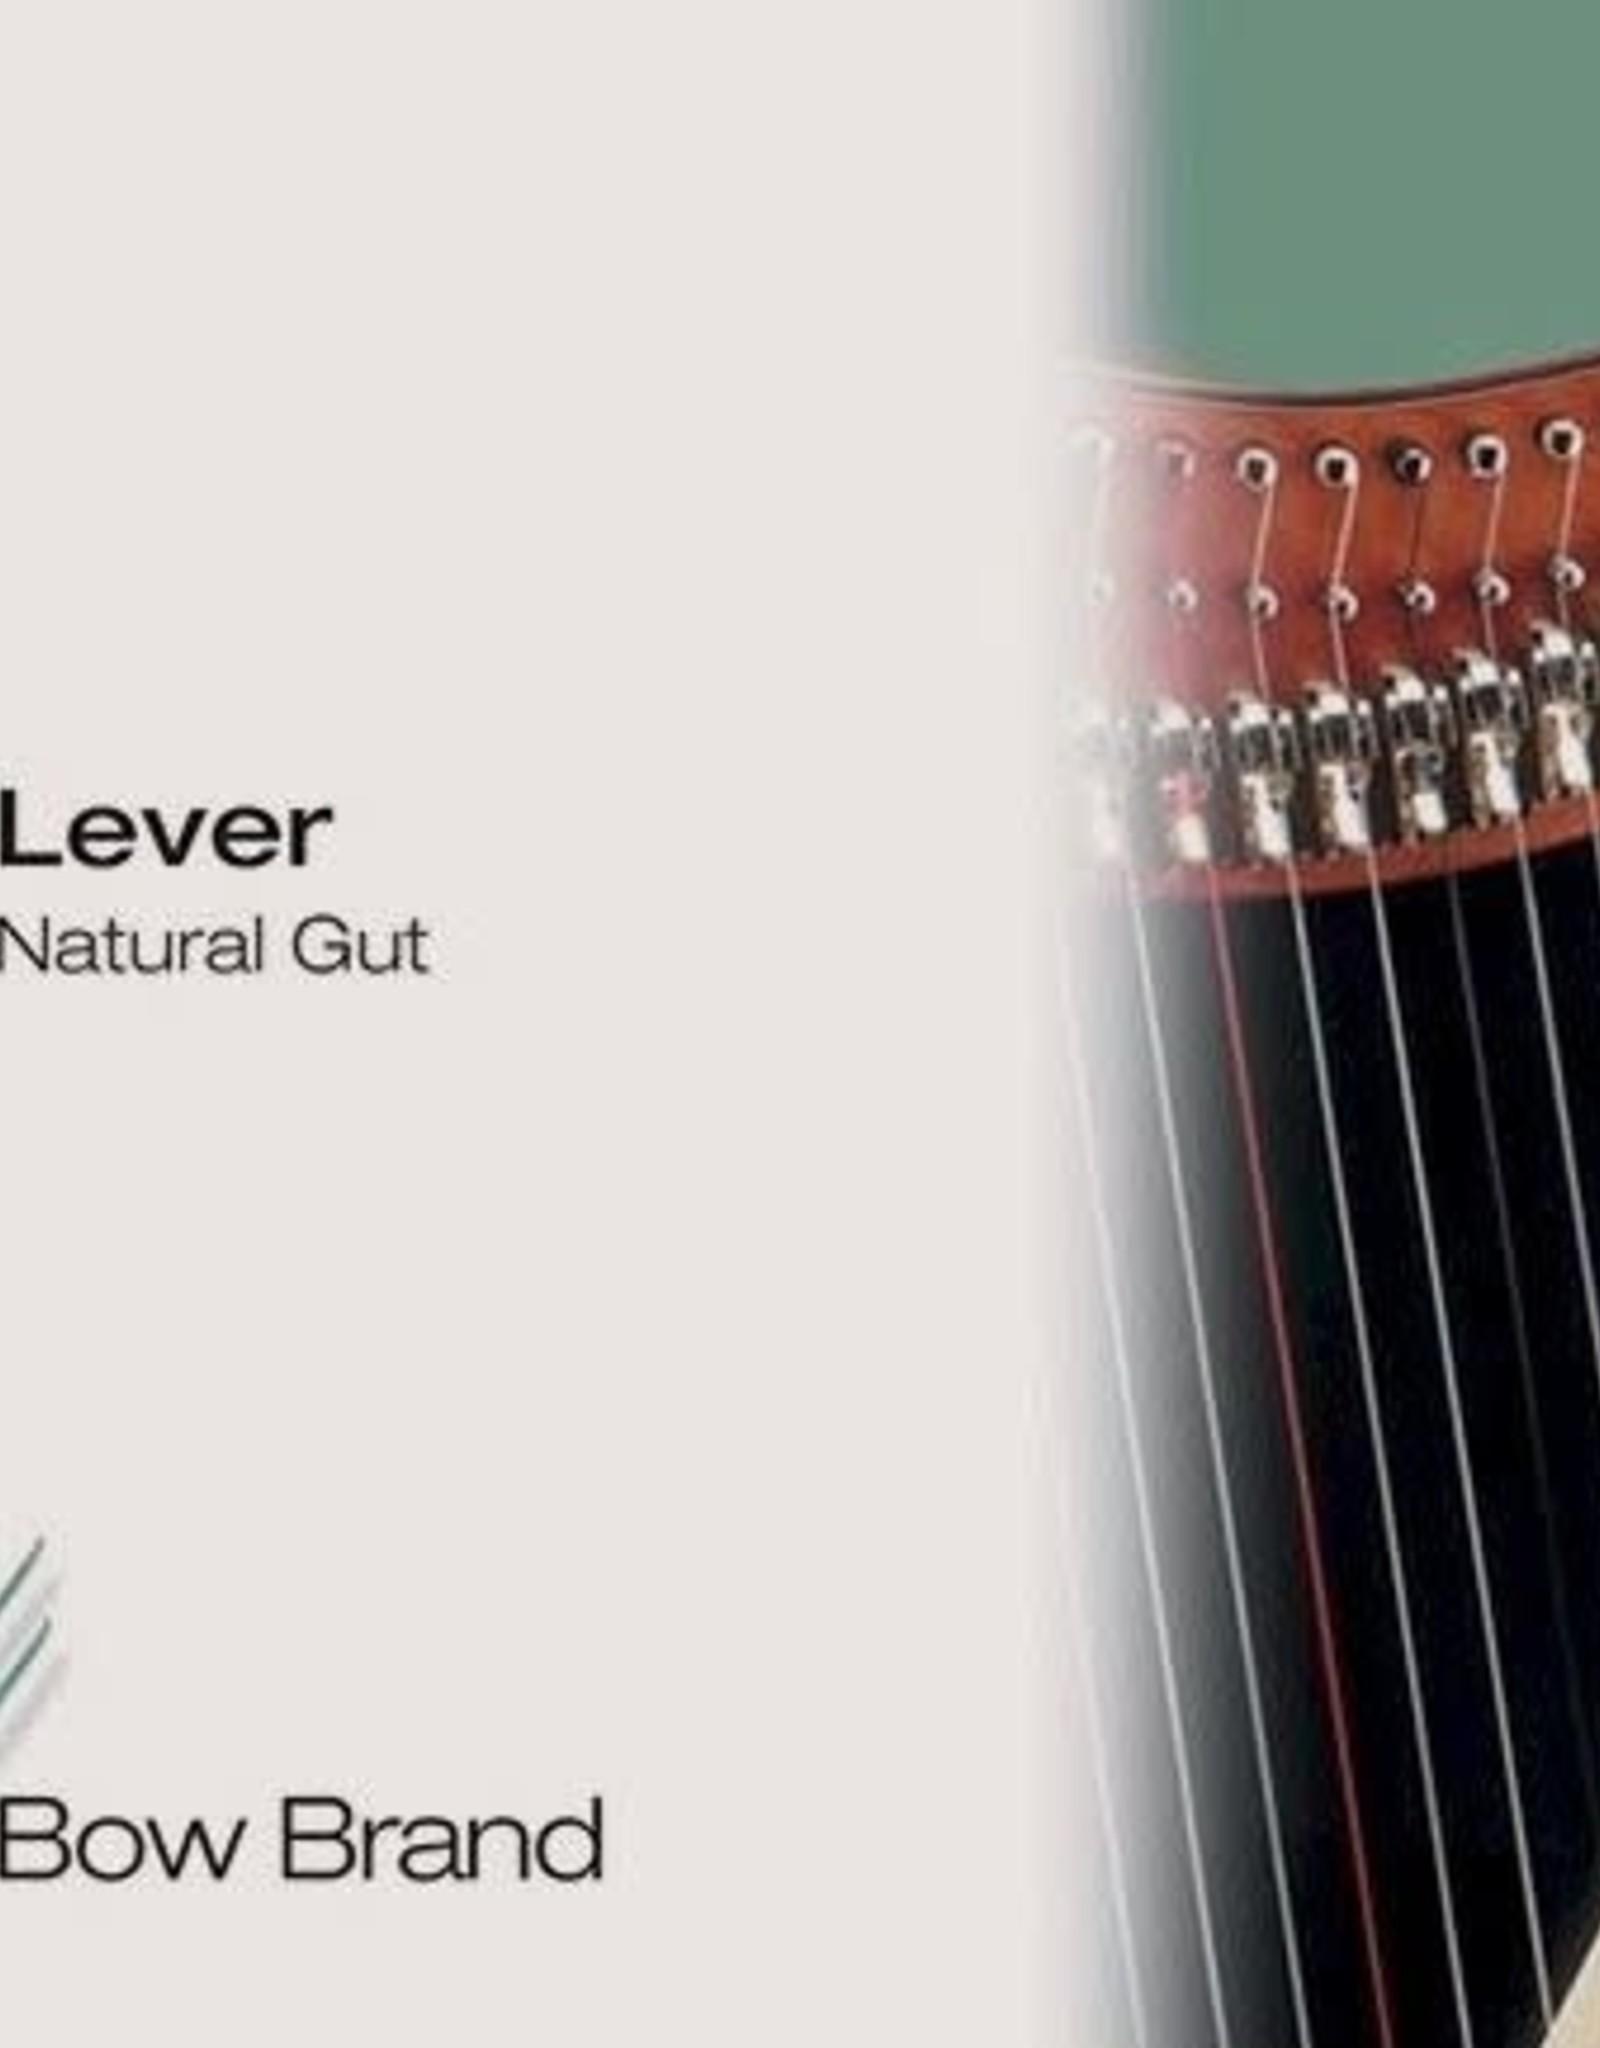 BOW BRAND  klep darm - lever GUT 10/2 do